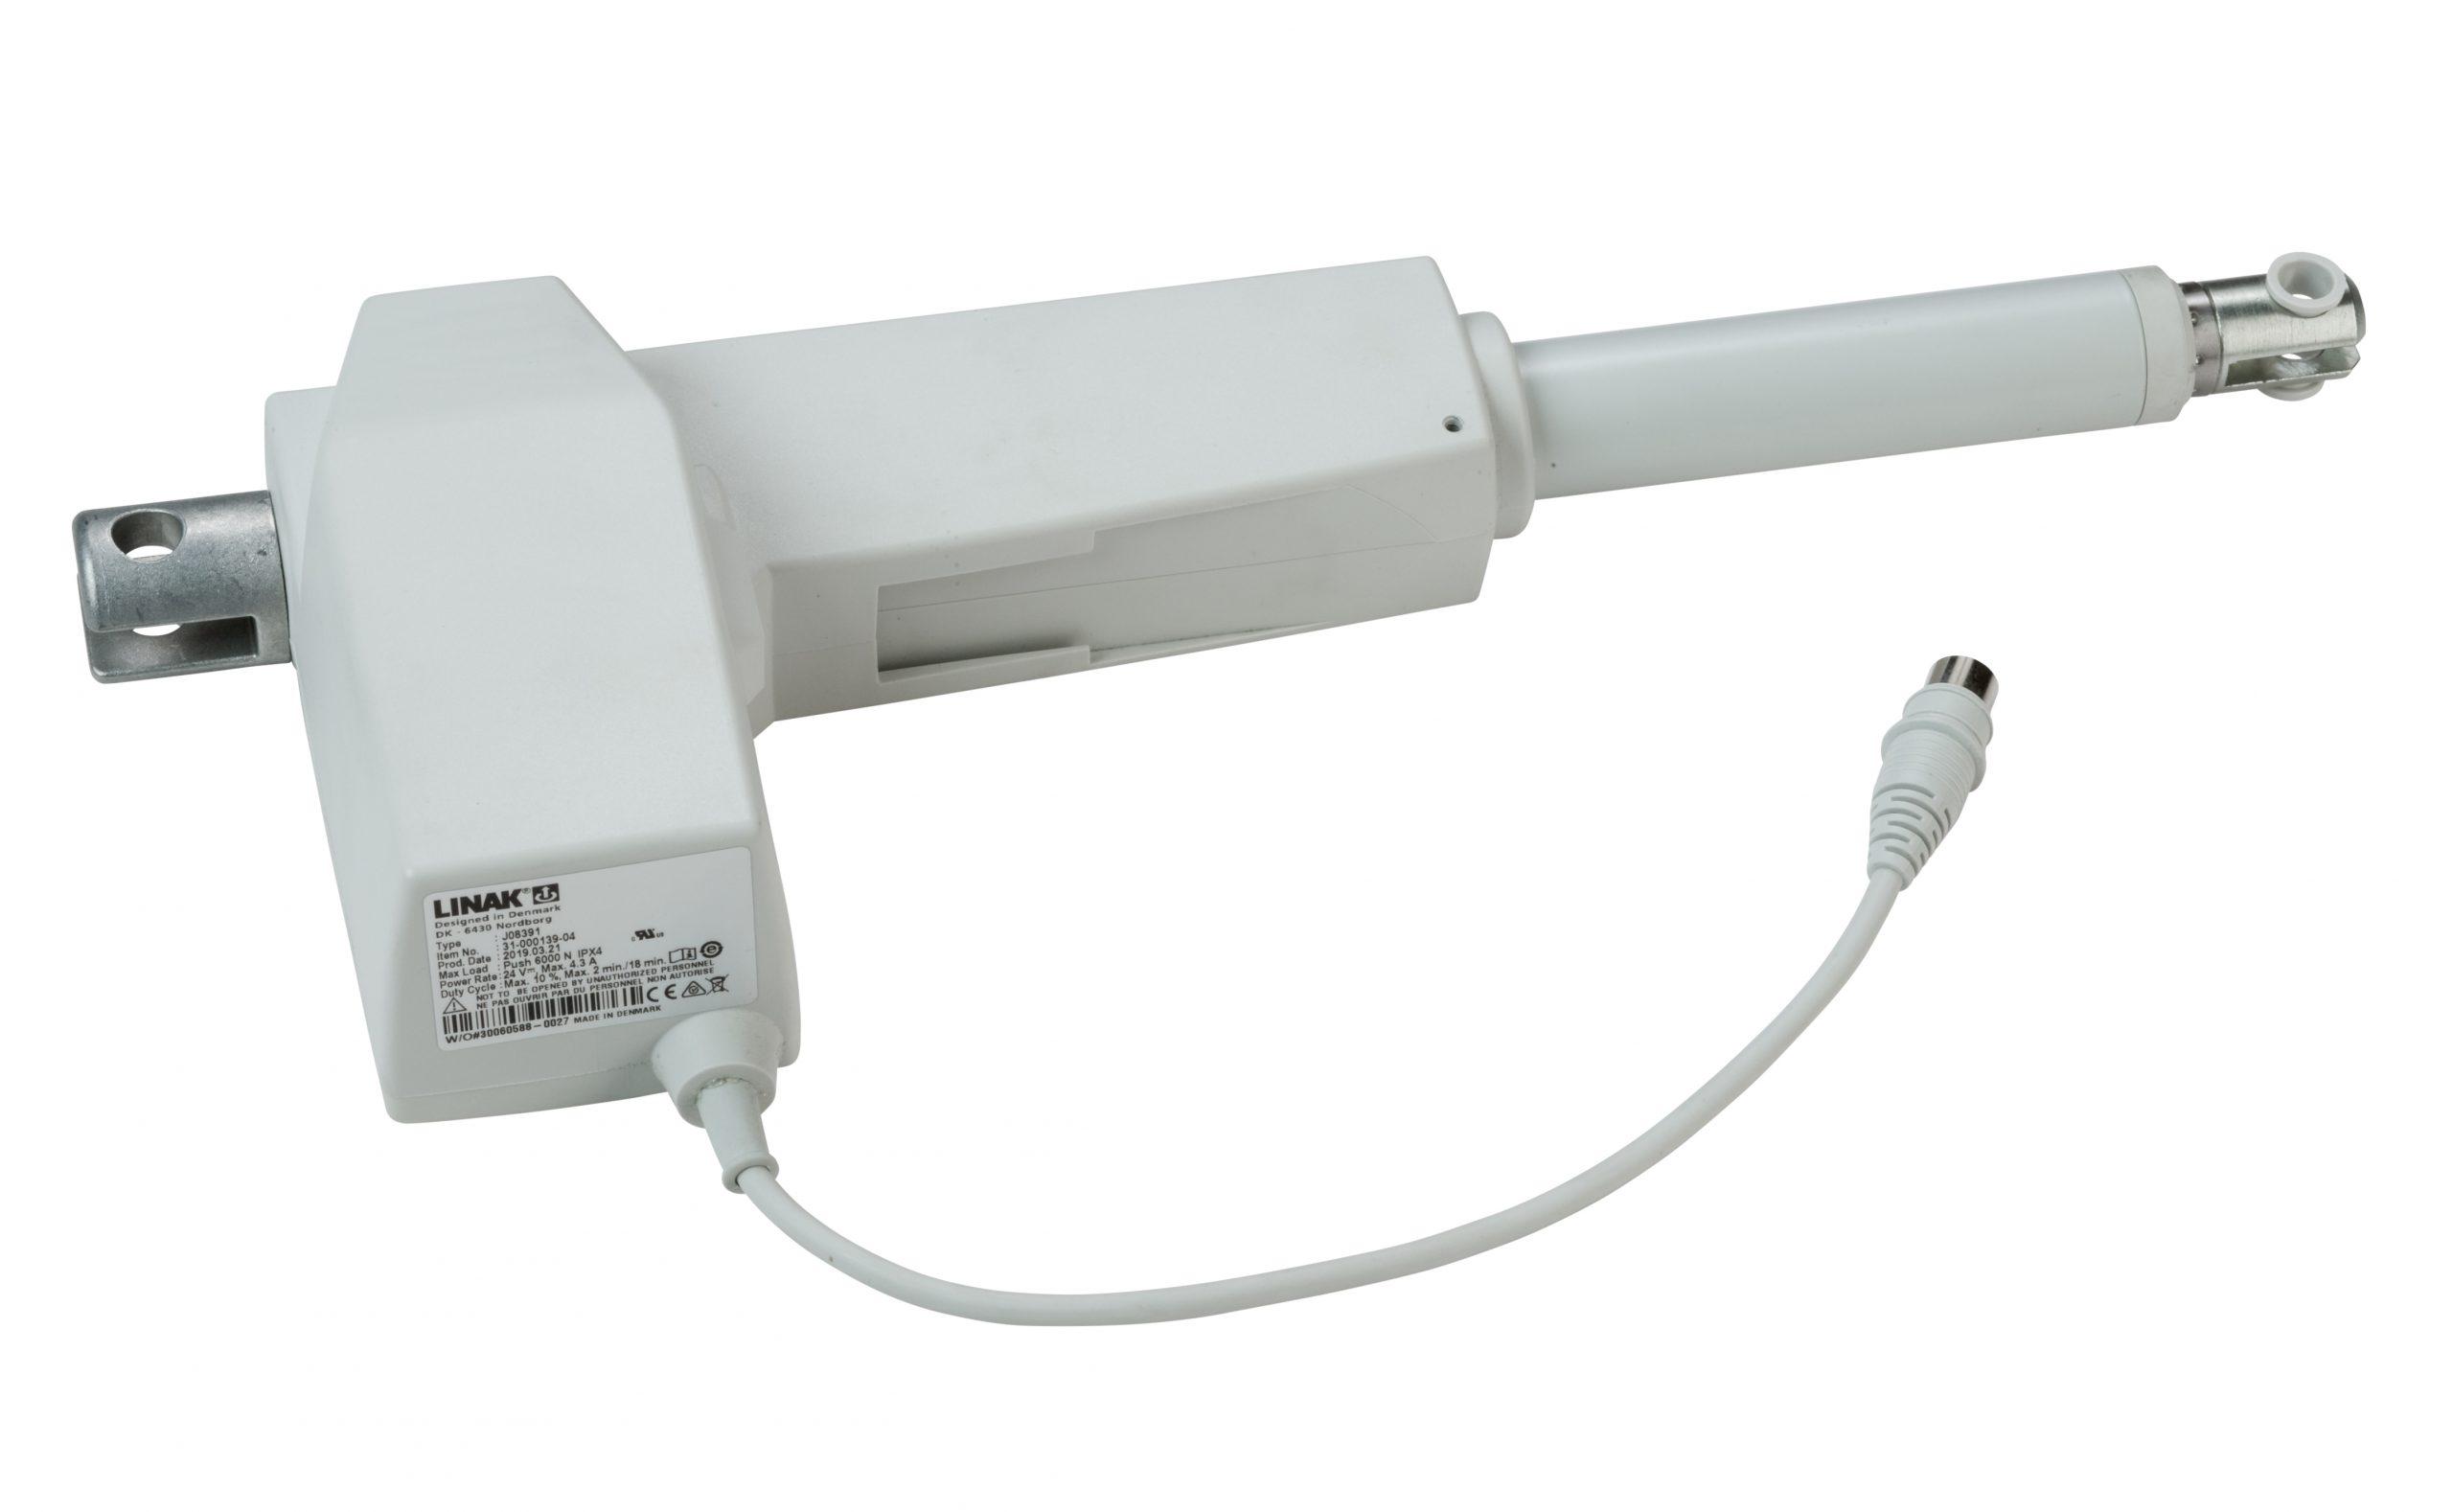 Linak LA31 – 6,000N Push – 200mm Stroke